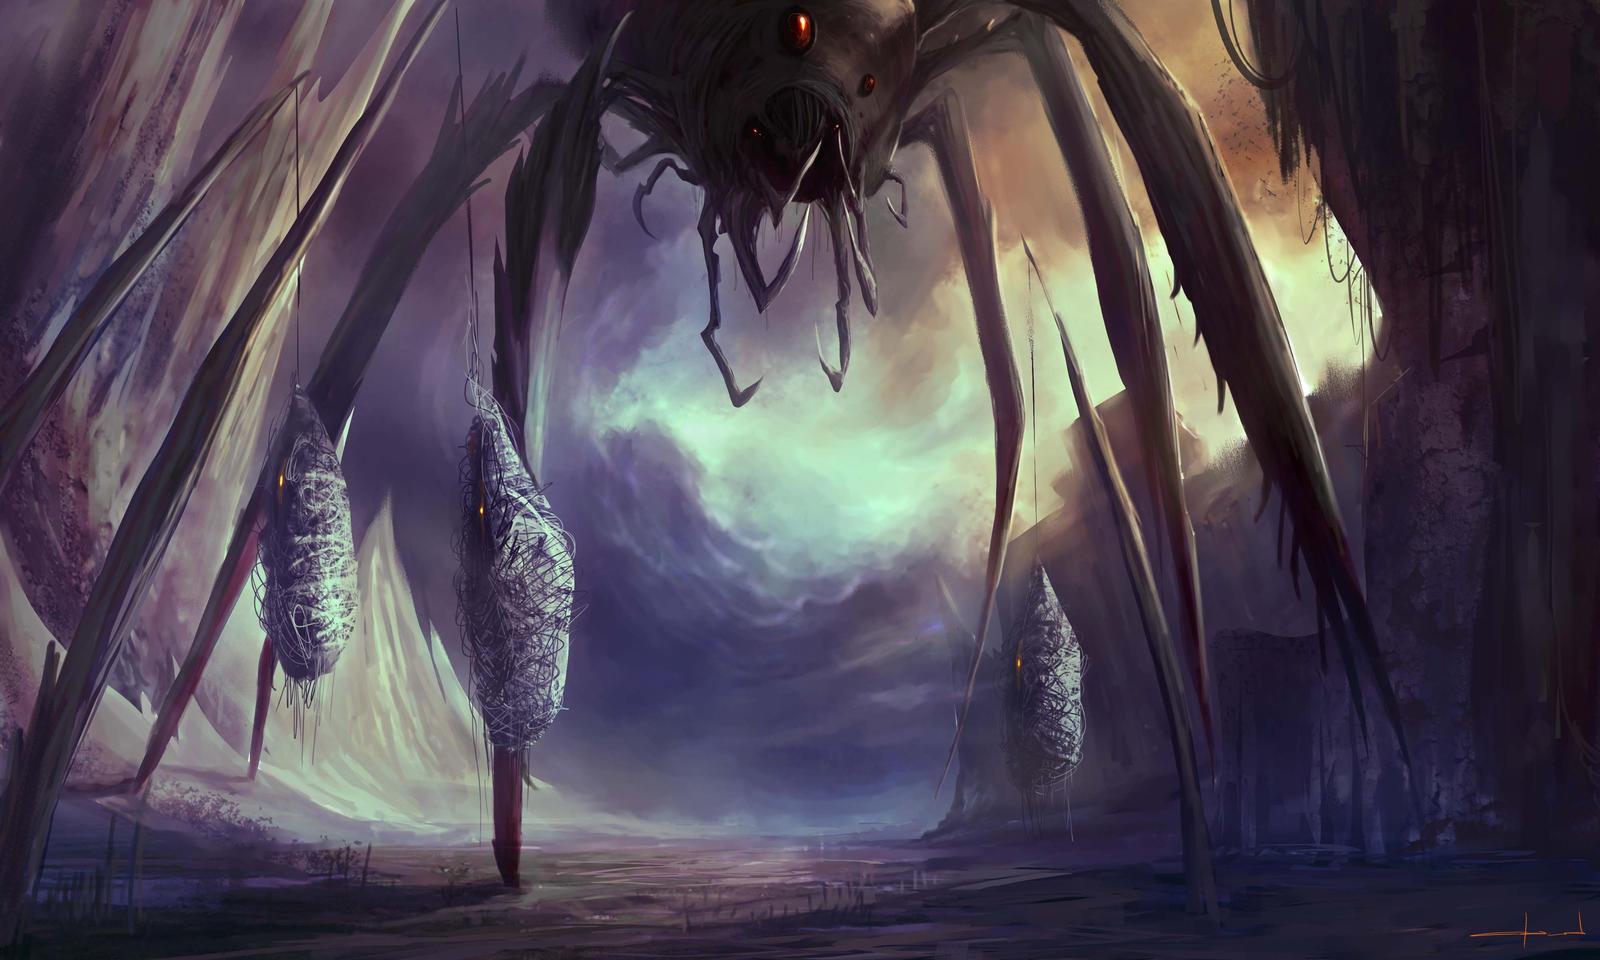 Giant Black Widow by Darkcloud013